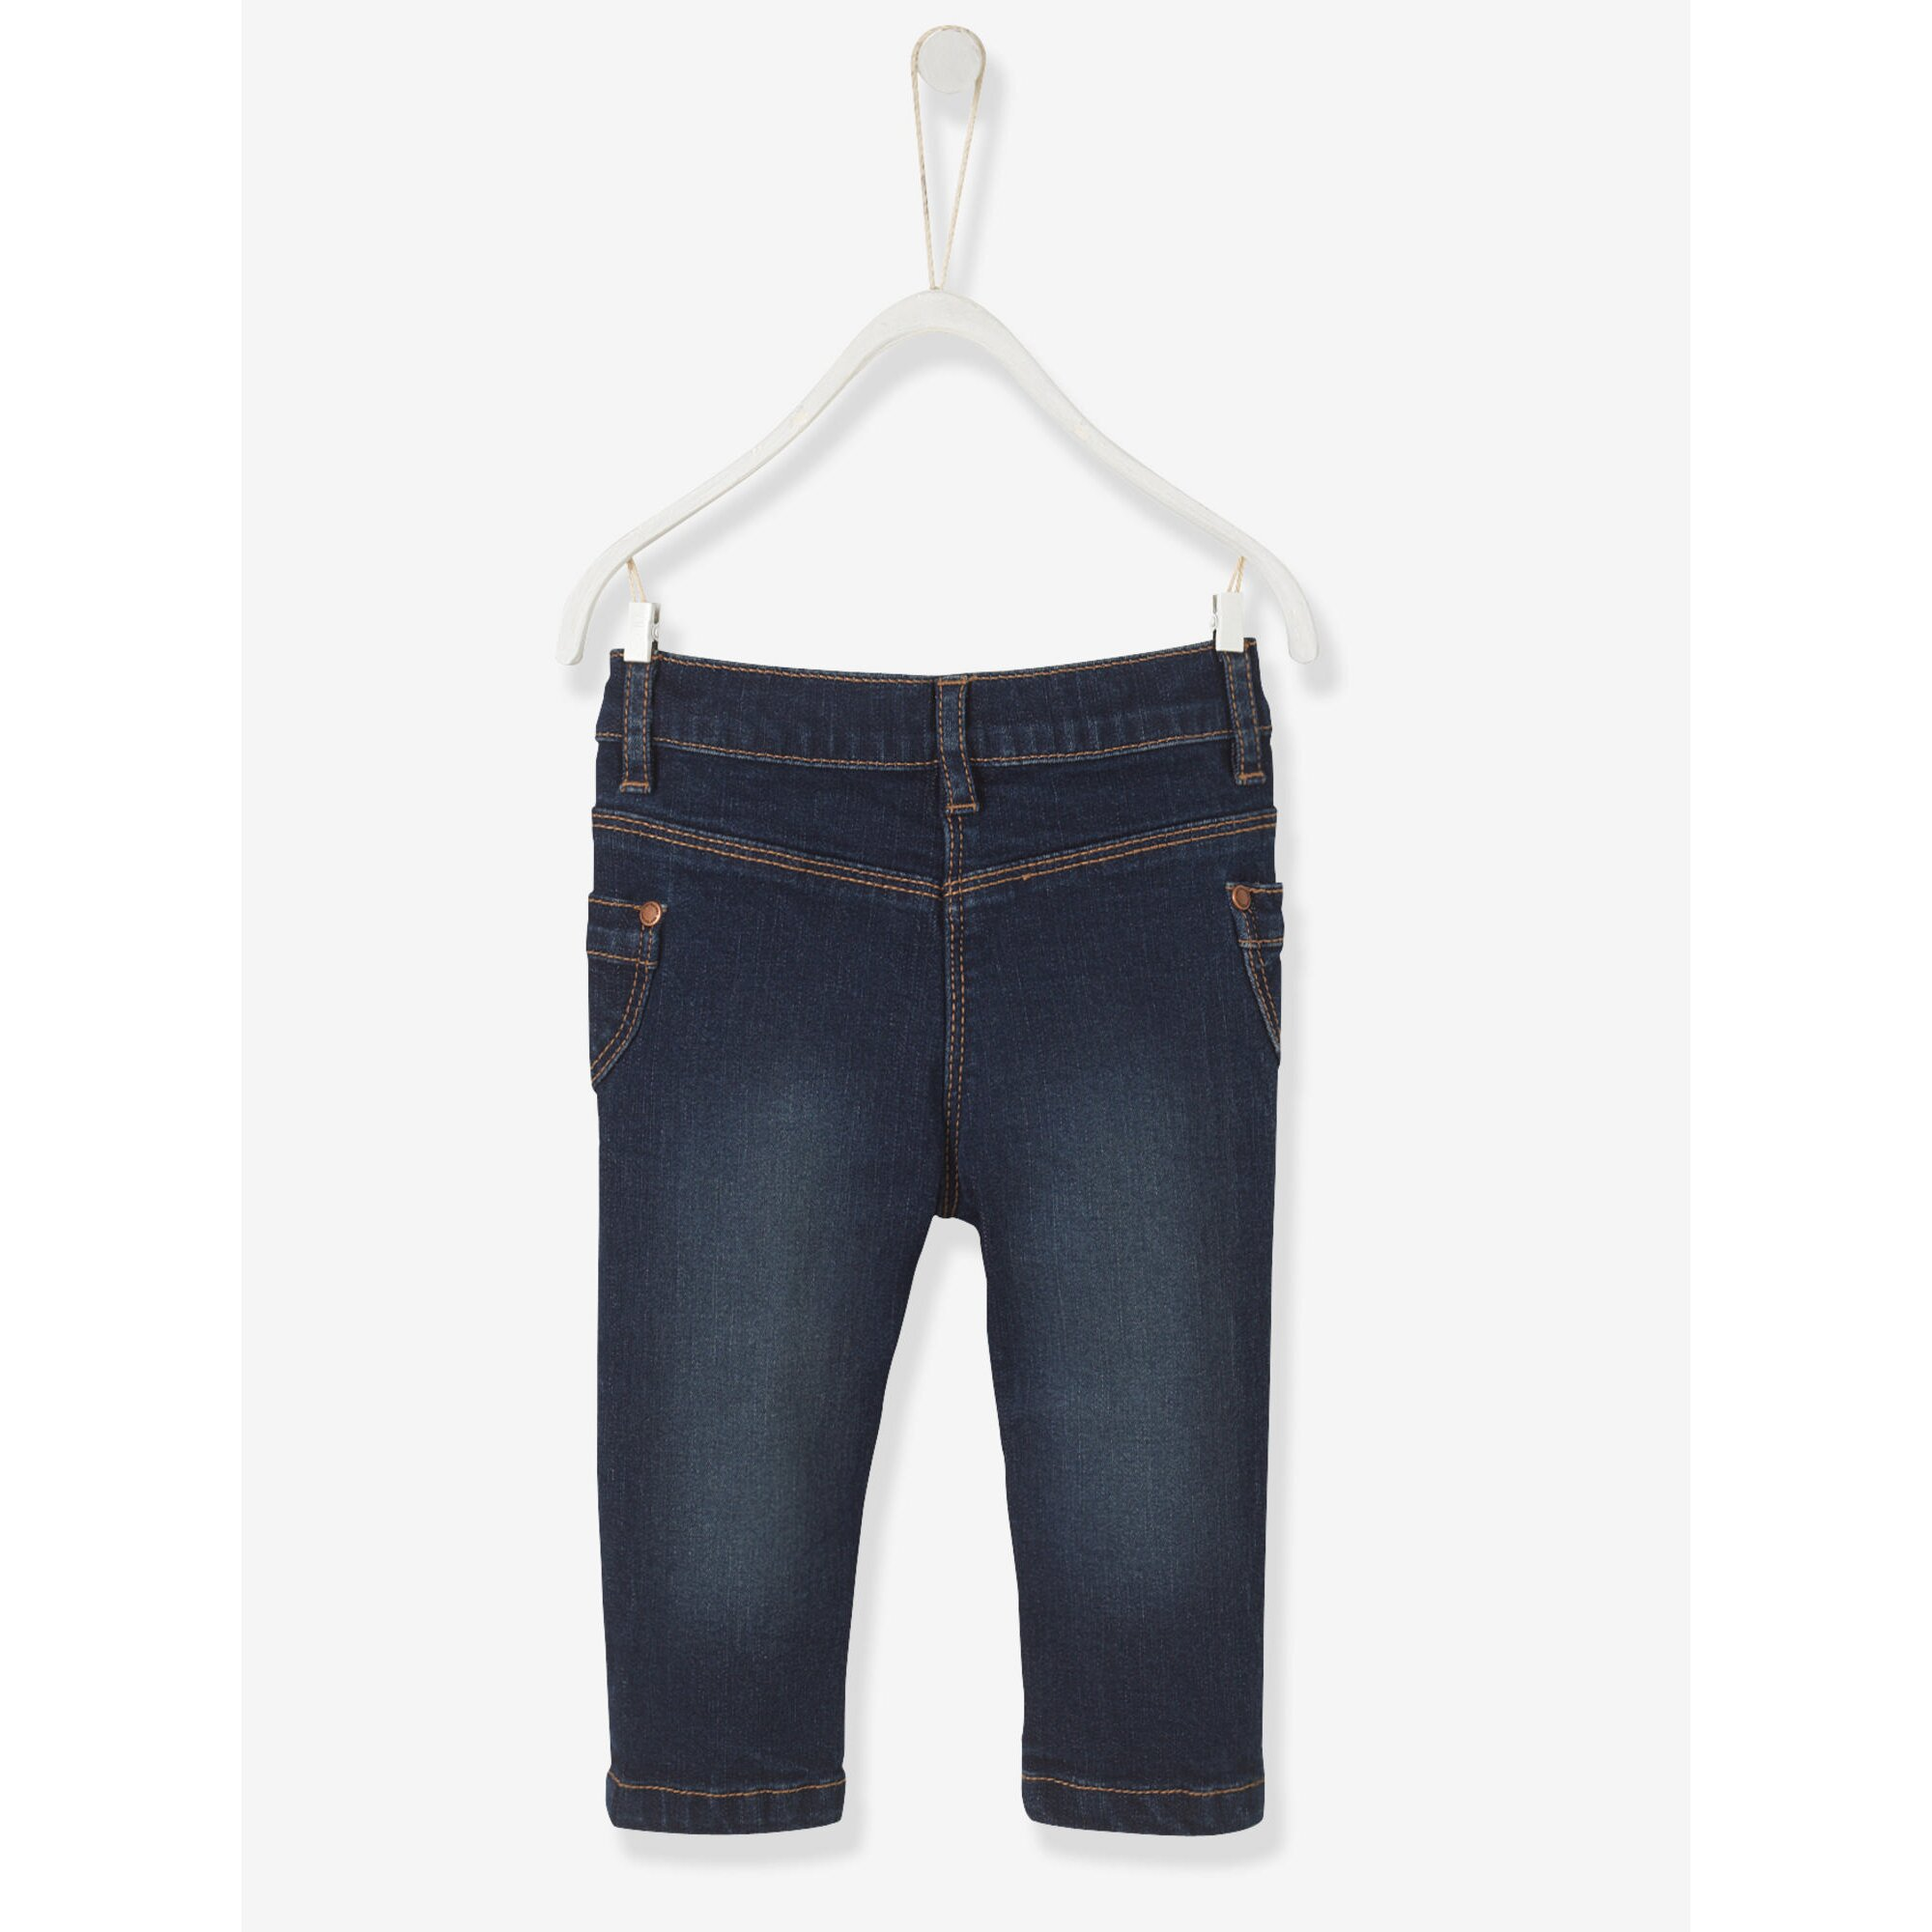 vertbaudet-gerade-jeans-fur-baby-madchen, 6.74 EUR @ babywalz-de